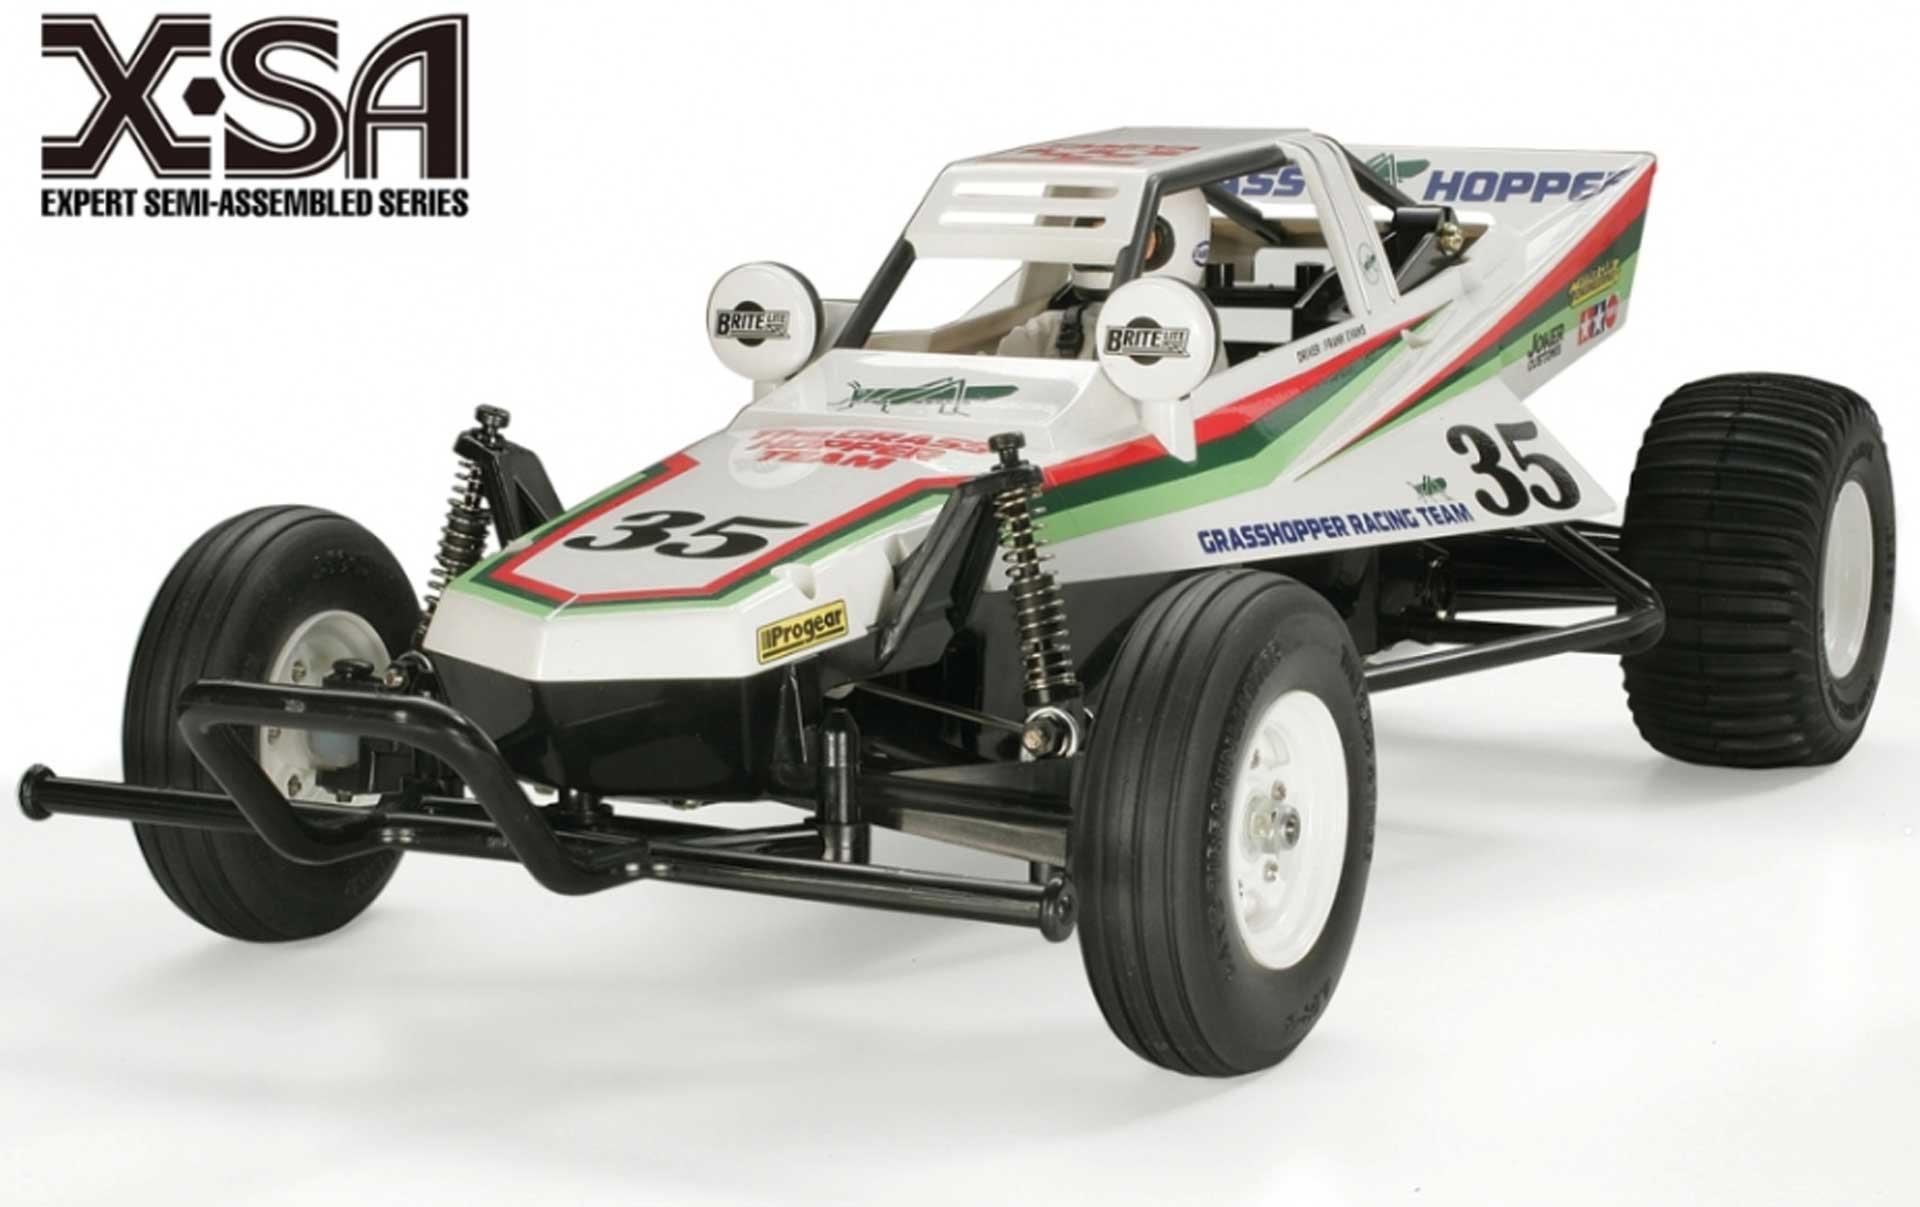 TAMIYA X-SA Grasshopper I 1/10 2WD Buggy EP fertig gebaut und lackiert